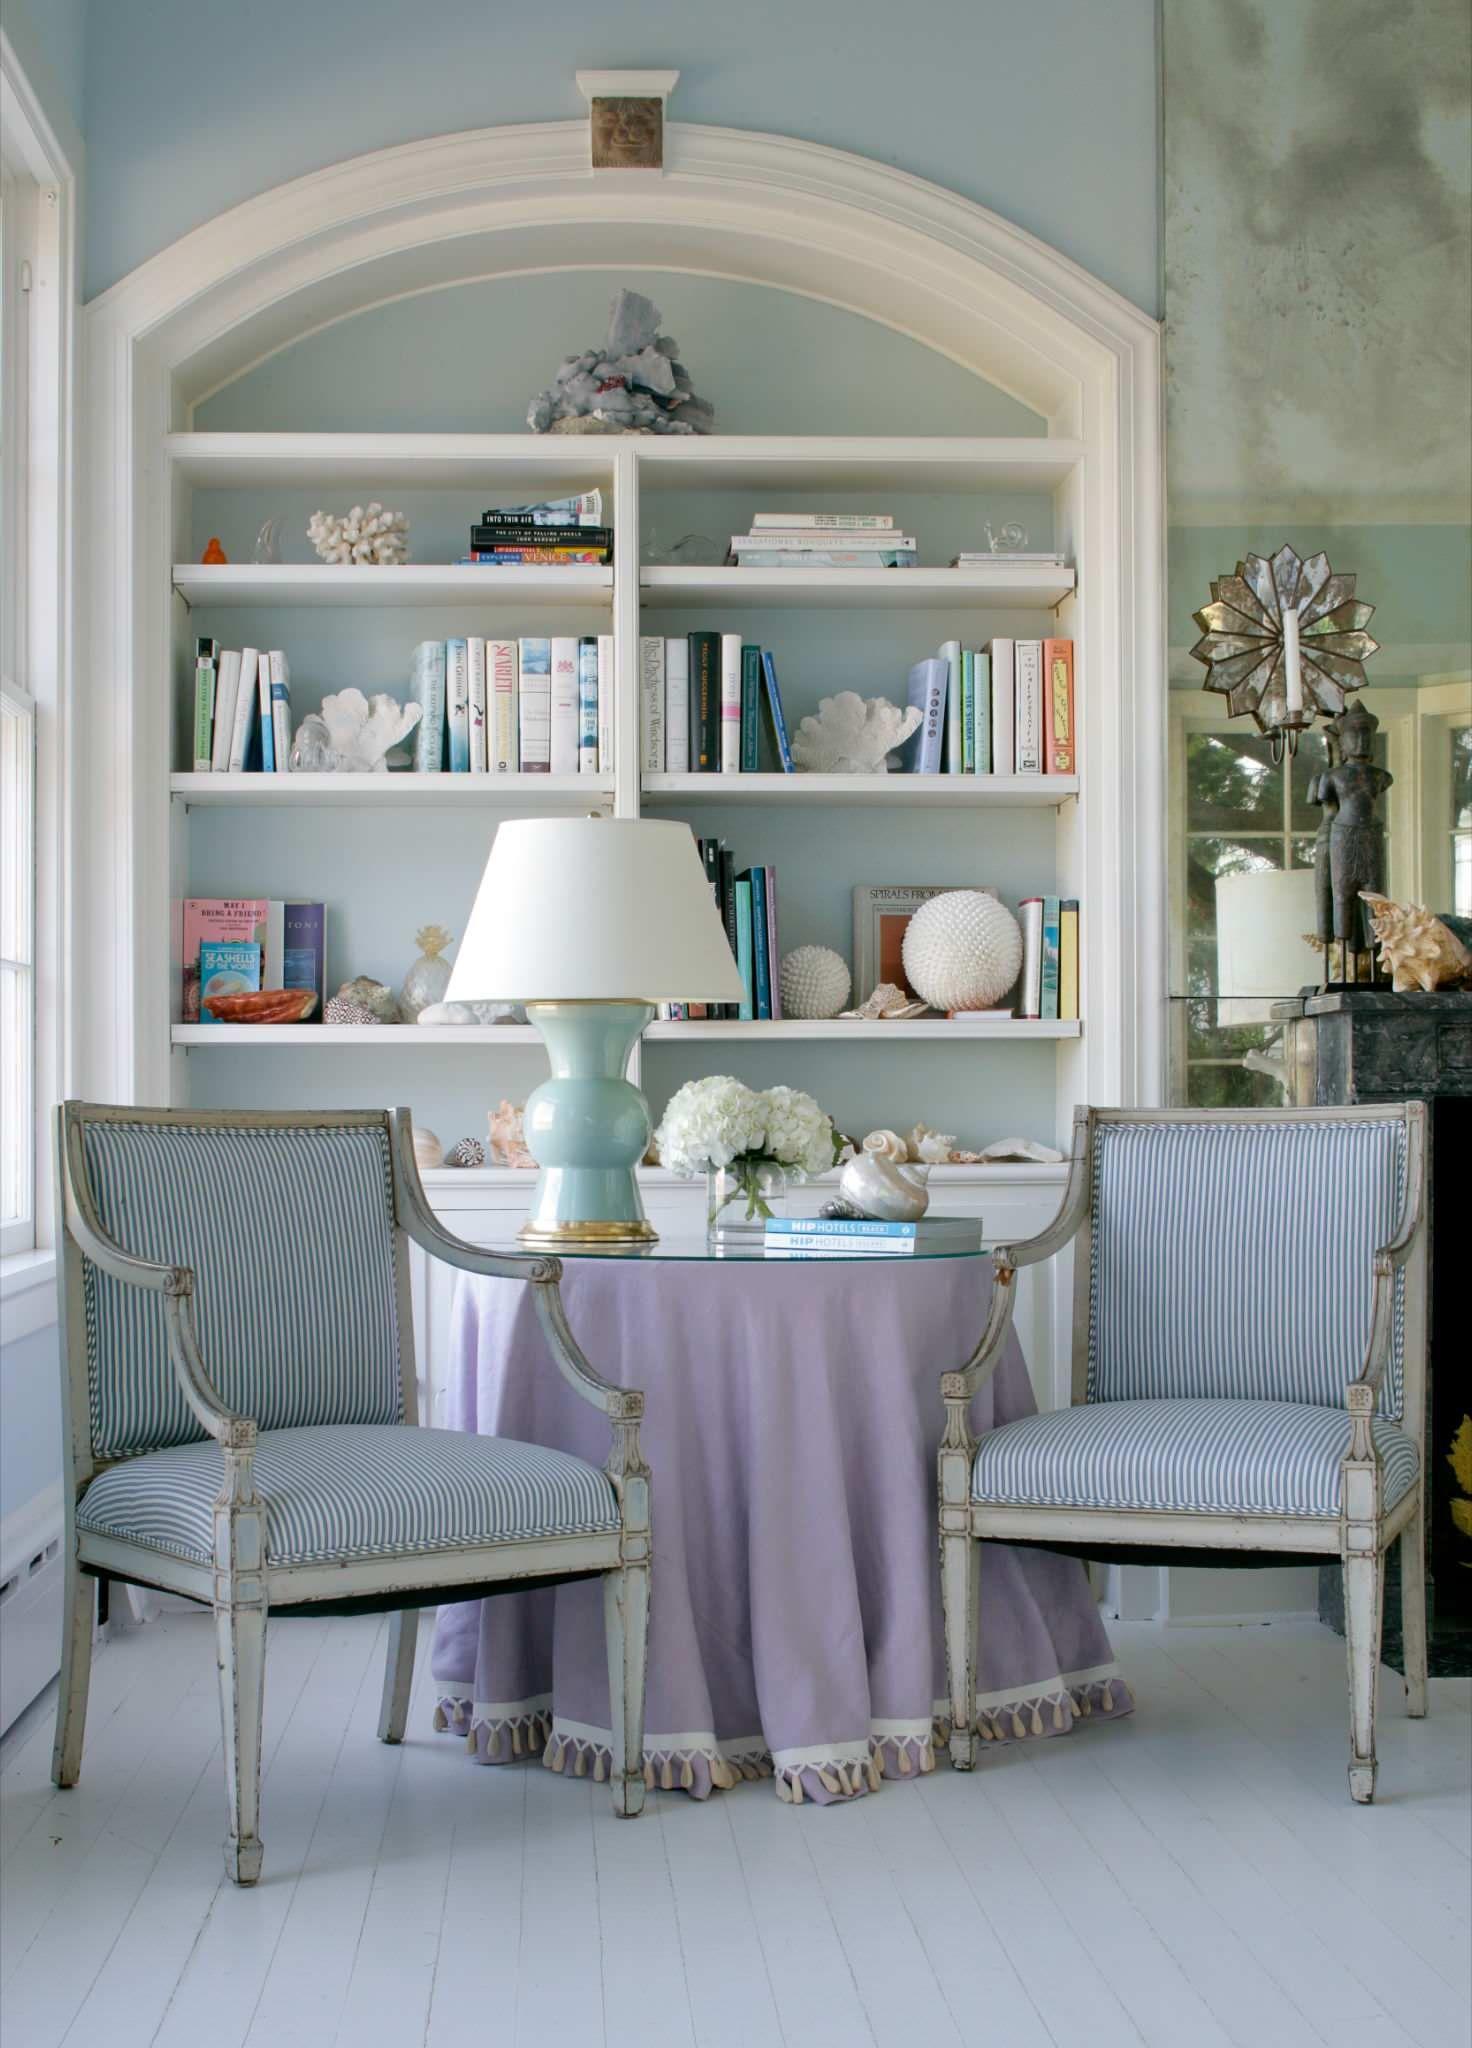 دکوراسیون منزل با رنگ آبی